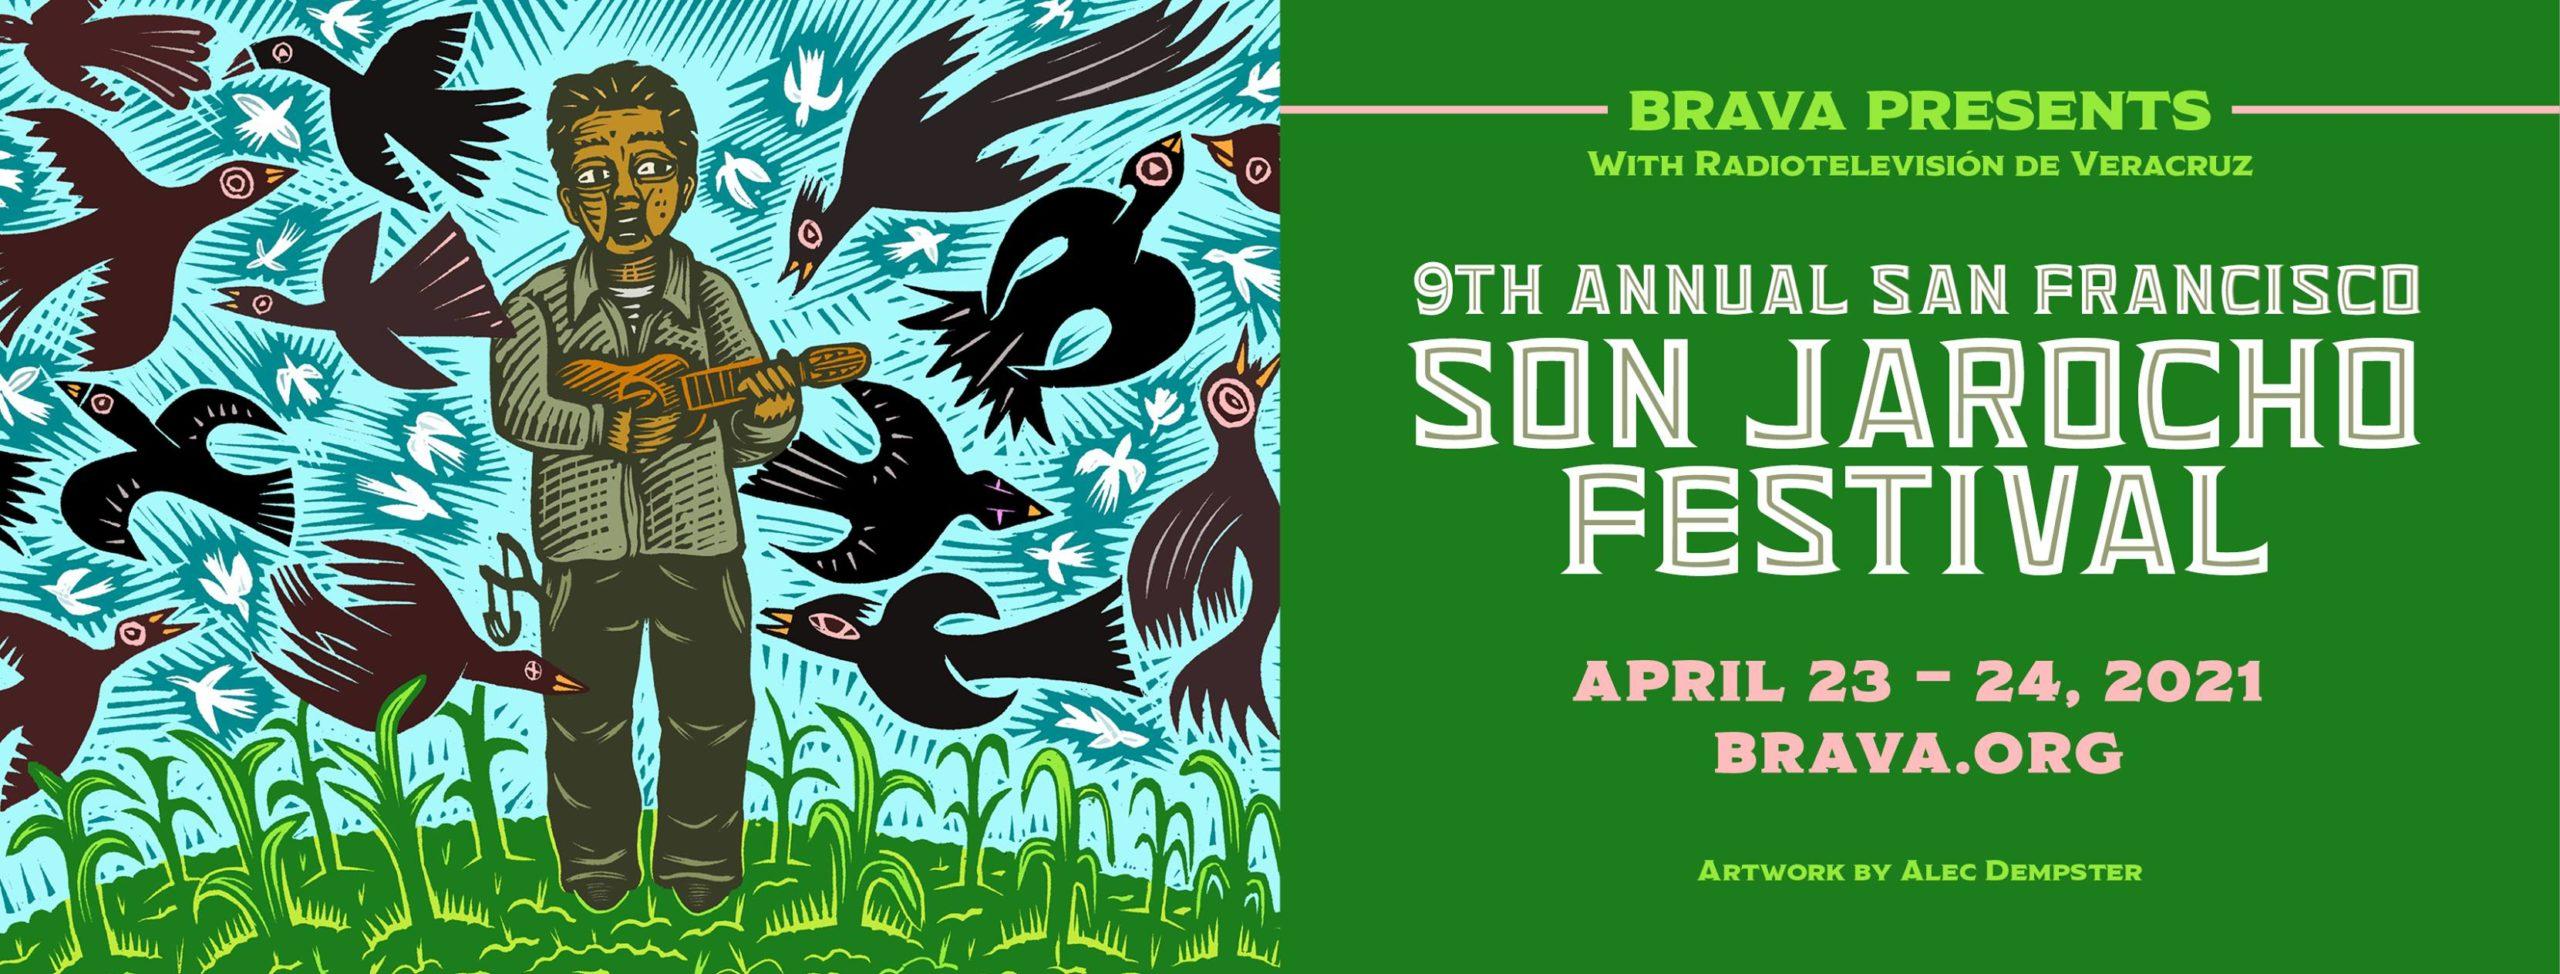 9º th annual San Francisco Son Jarocho Festival